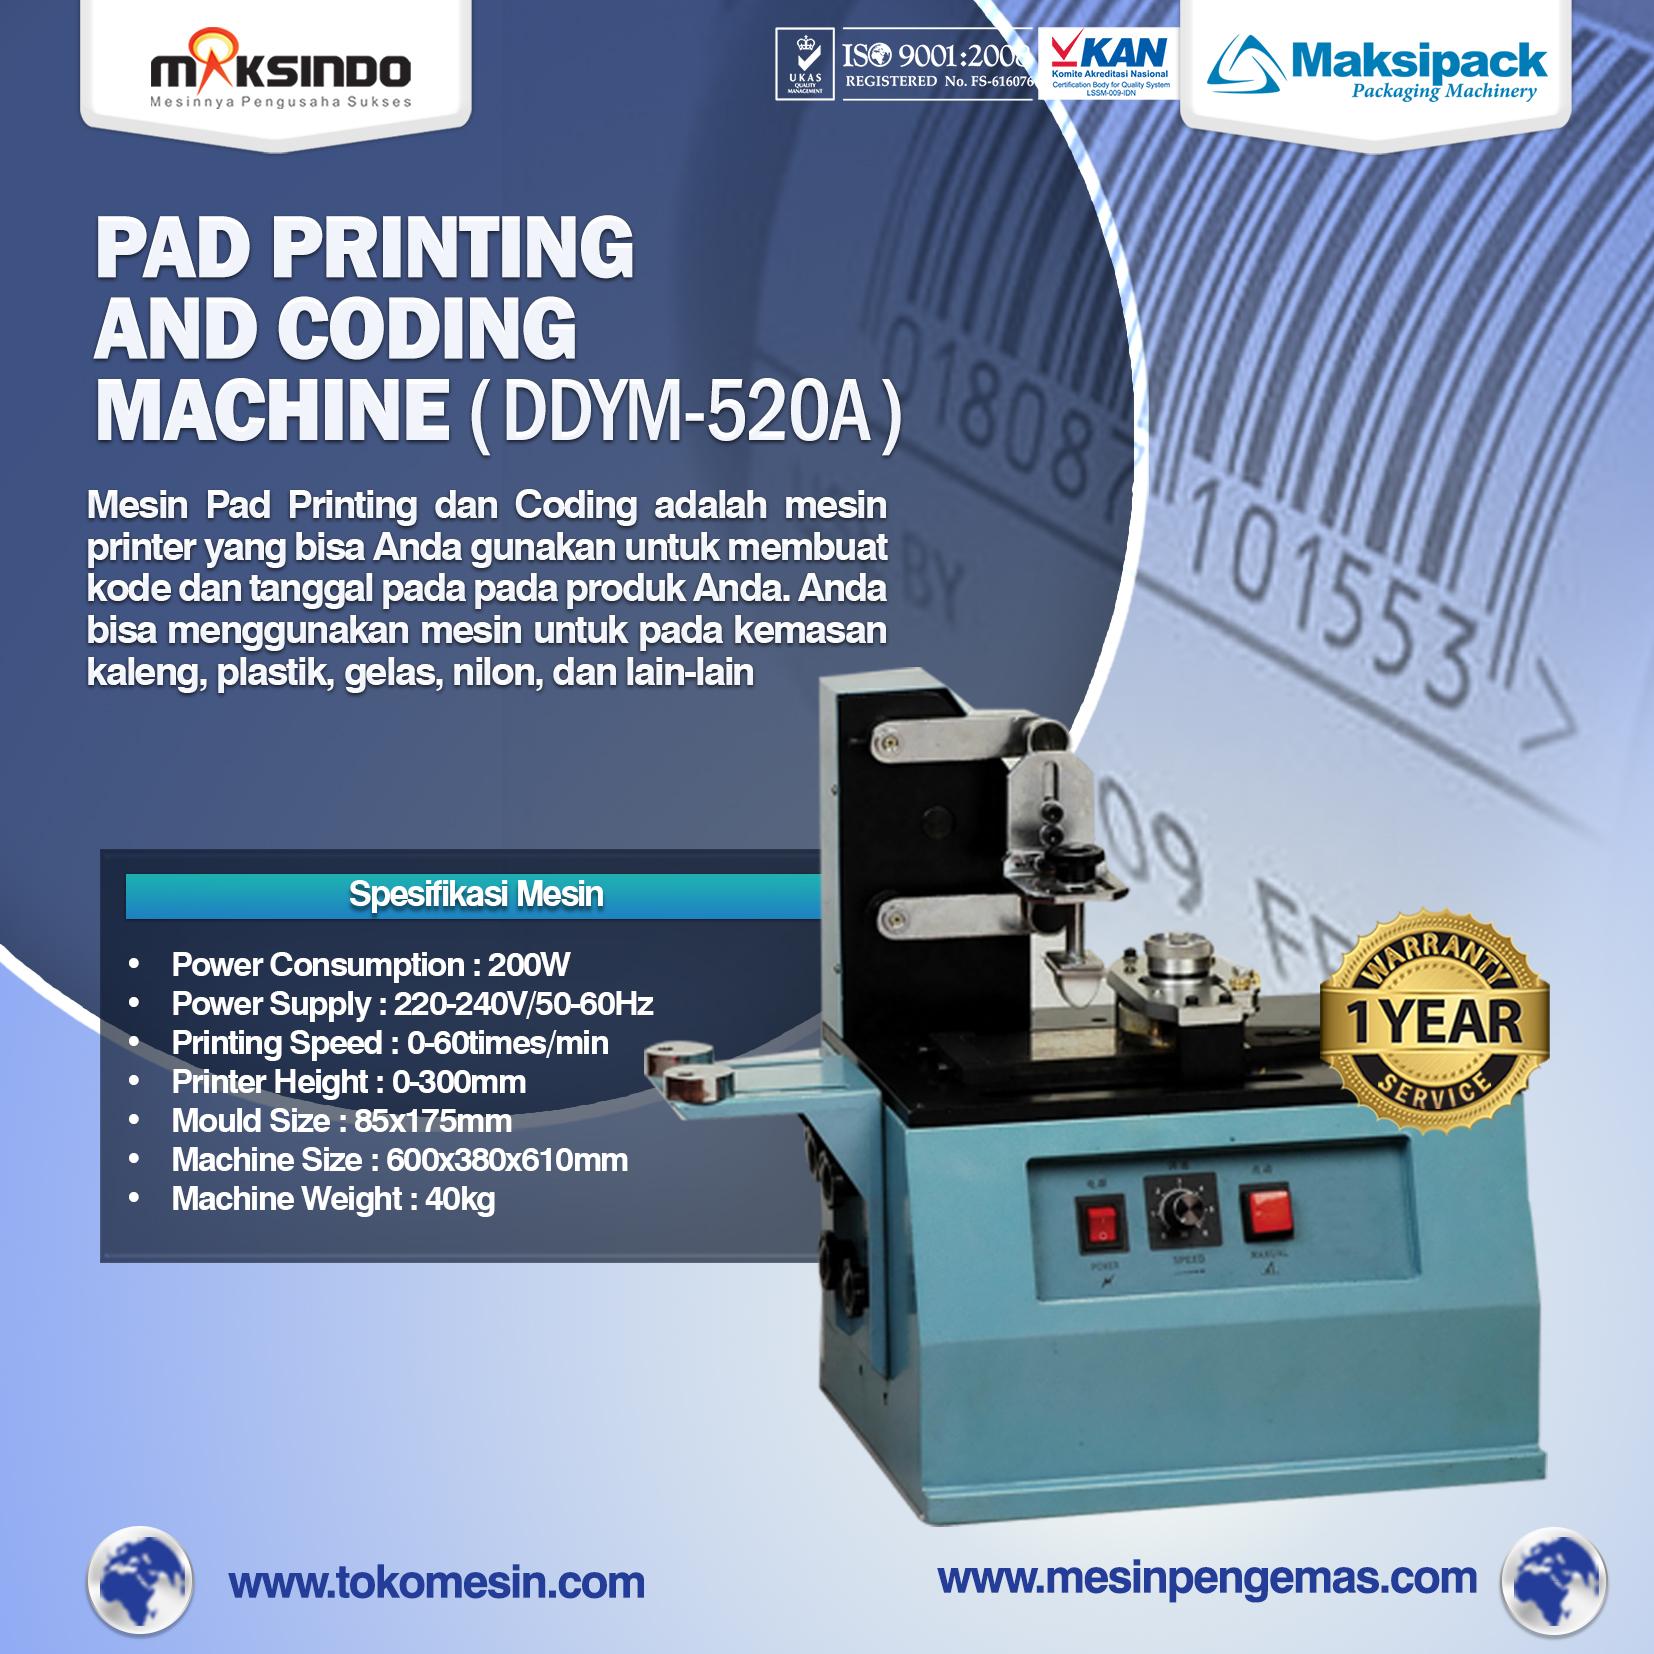 Pad Printing Machine (DDYM-520A)